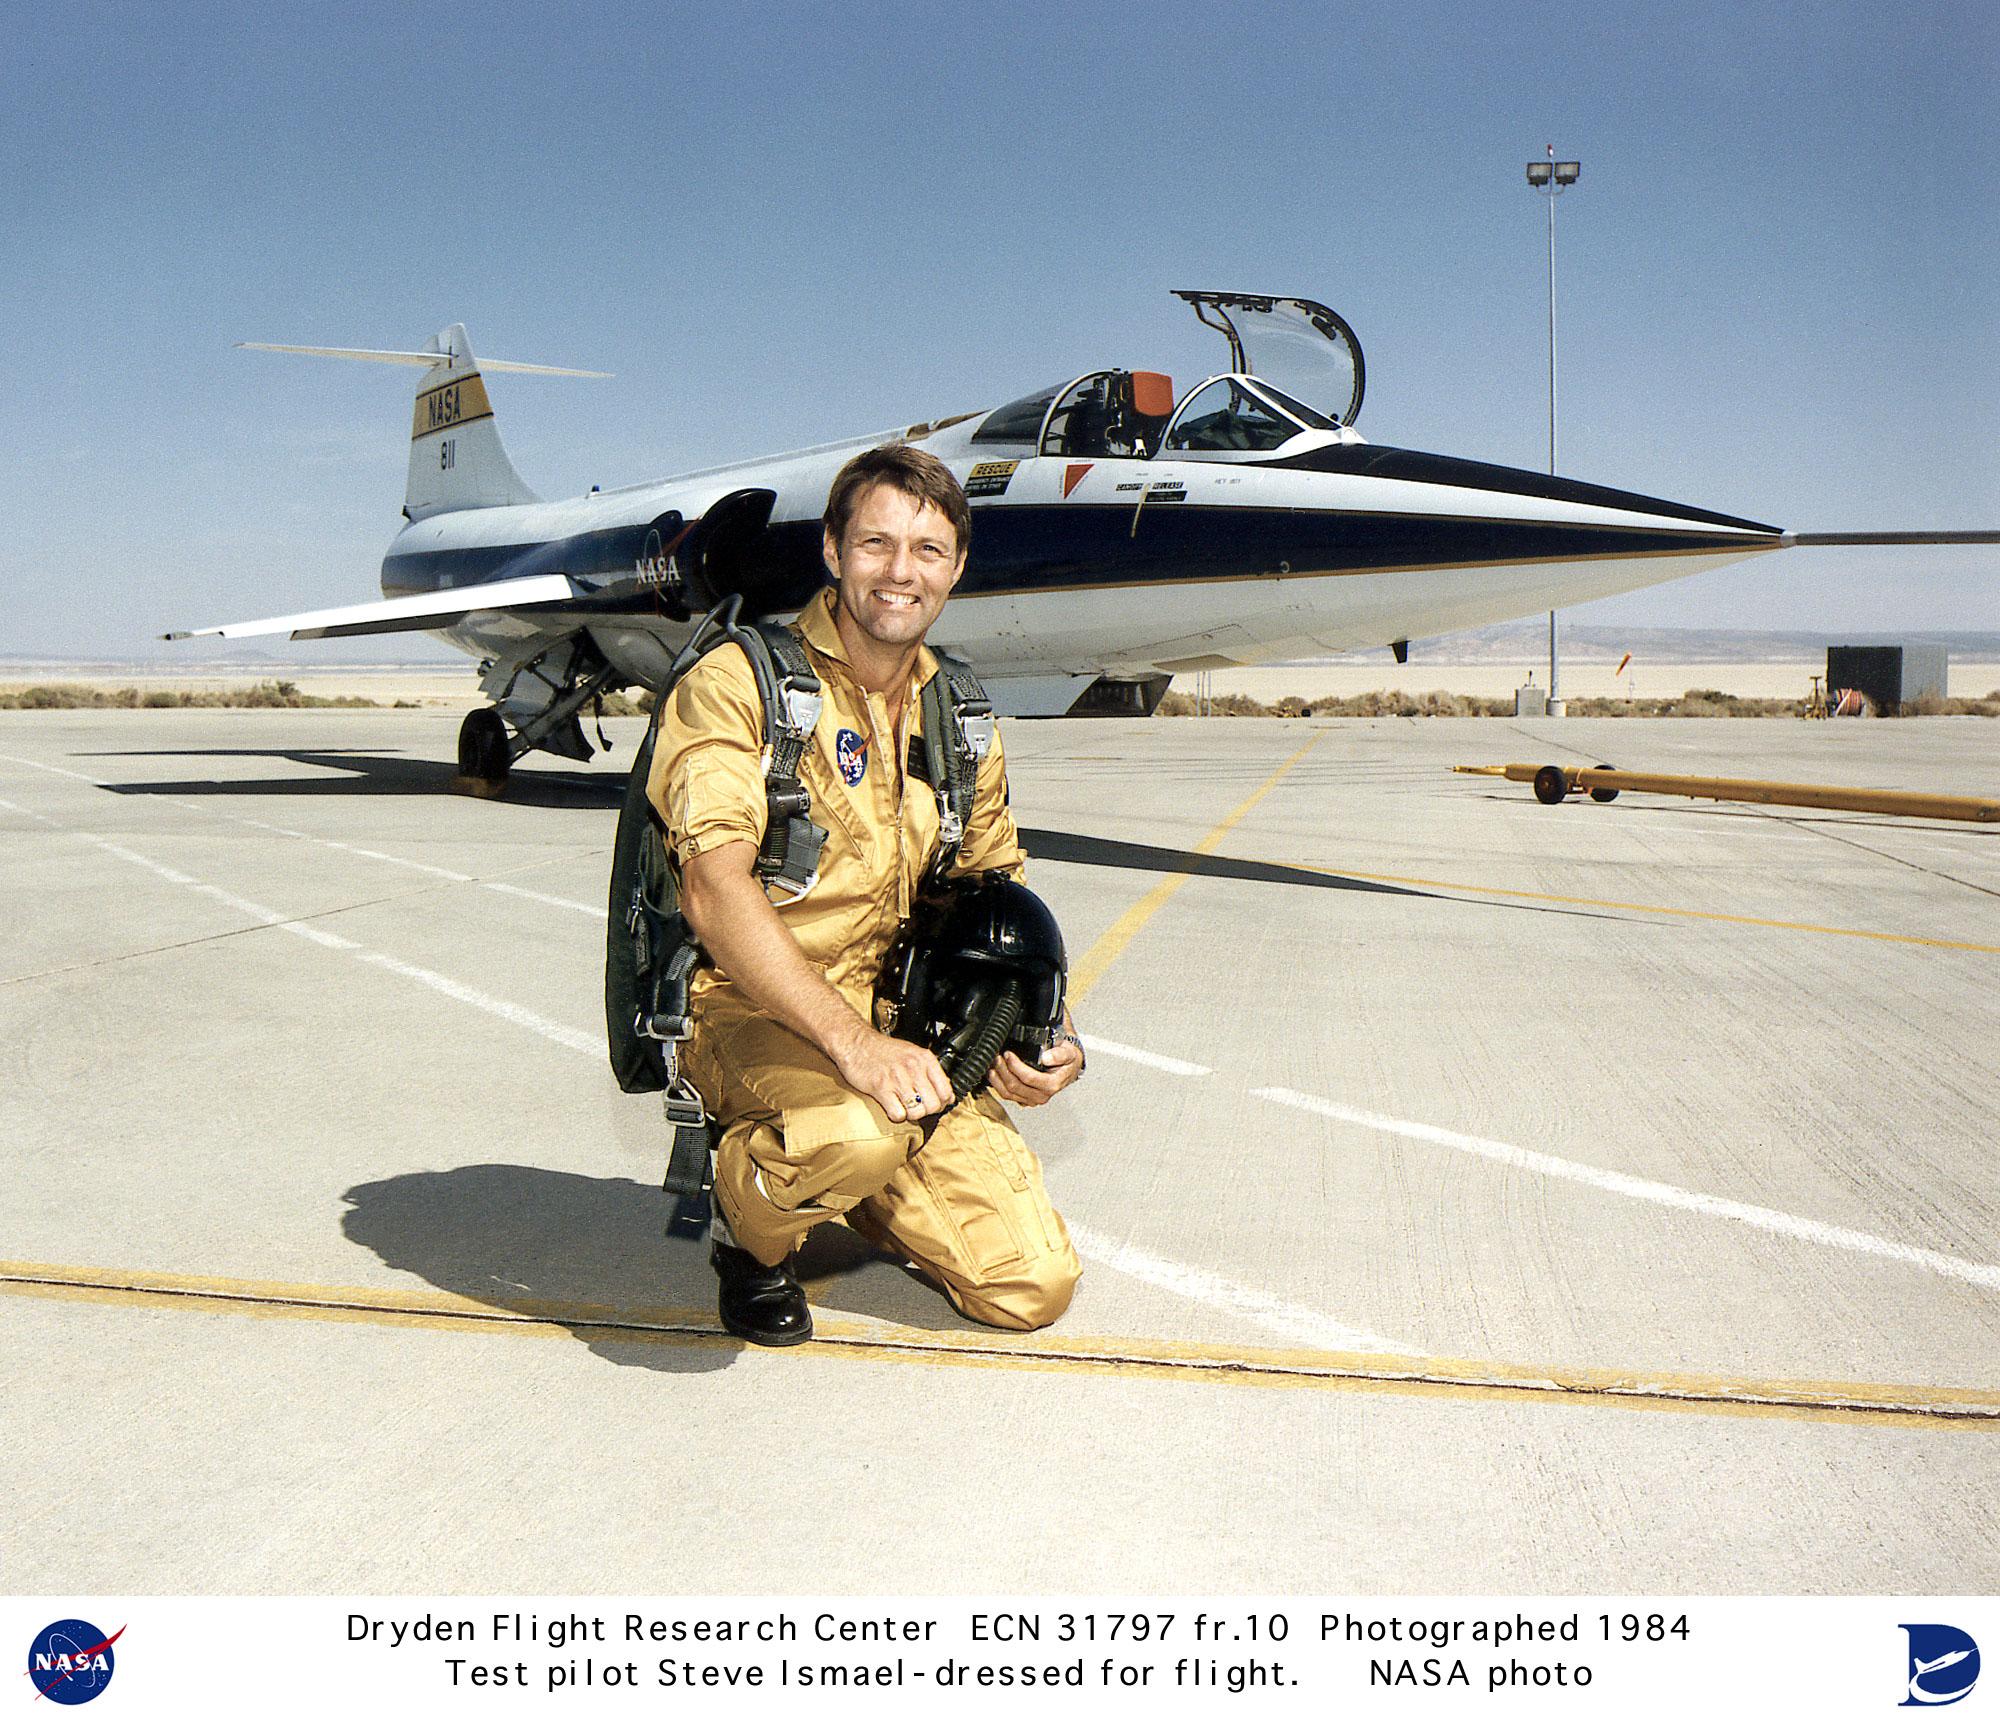 Pilots ECN-31797-FR10: F-104 with research pilot Steve Ishmael